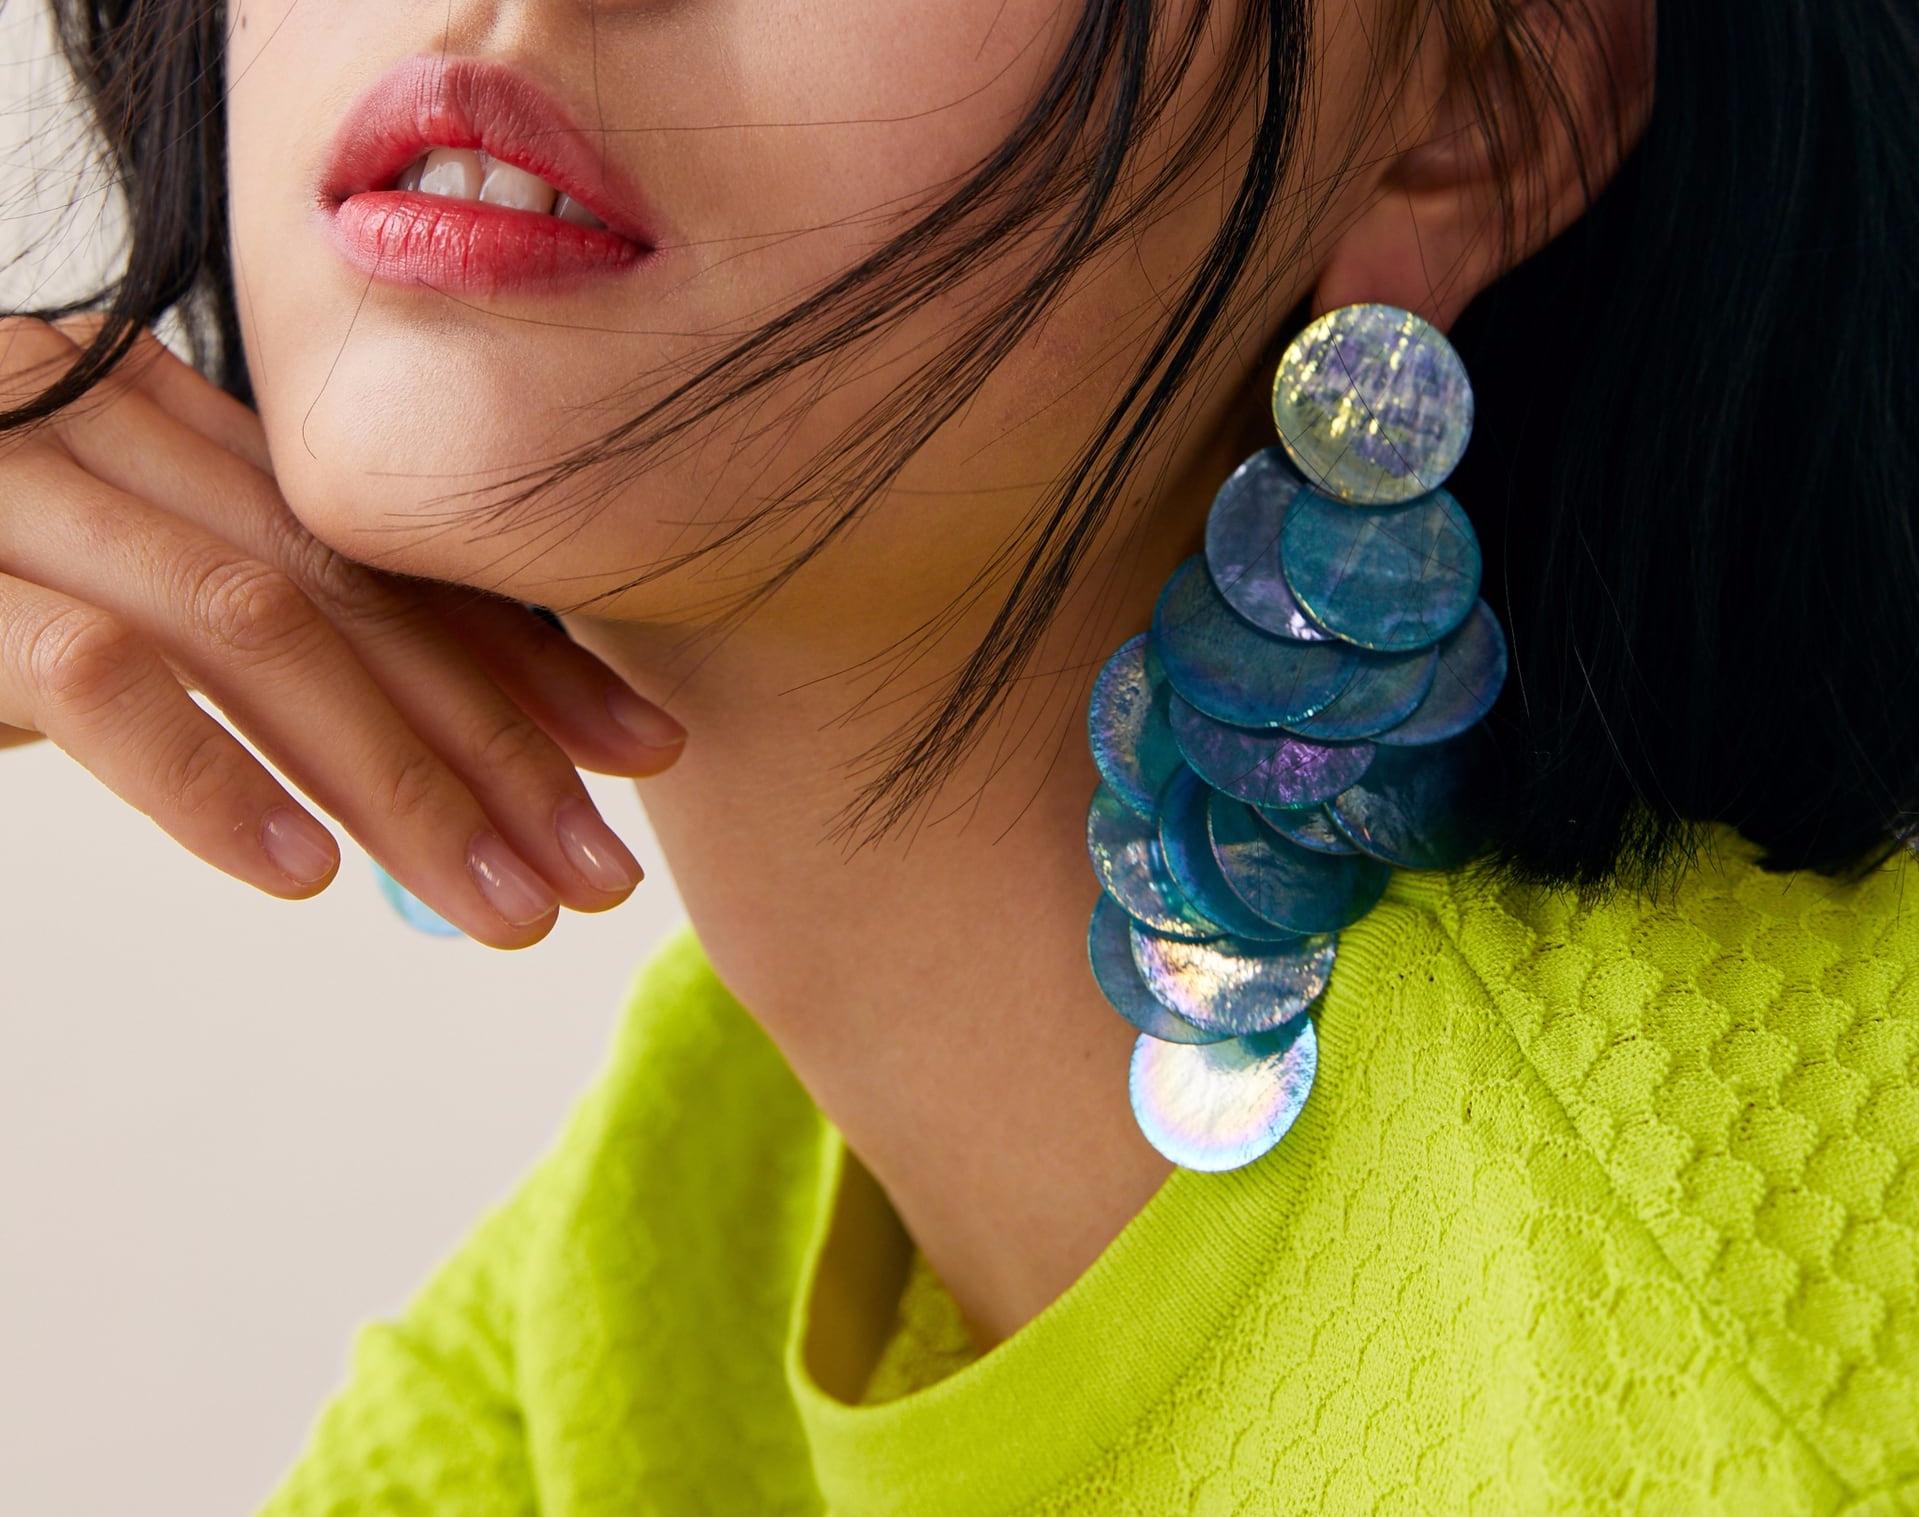 Zara iridescent scale earrings